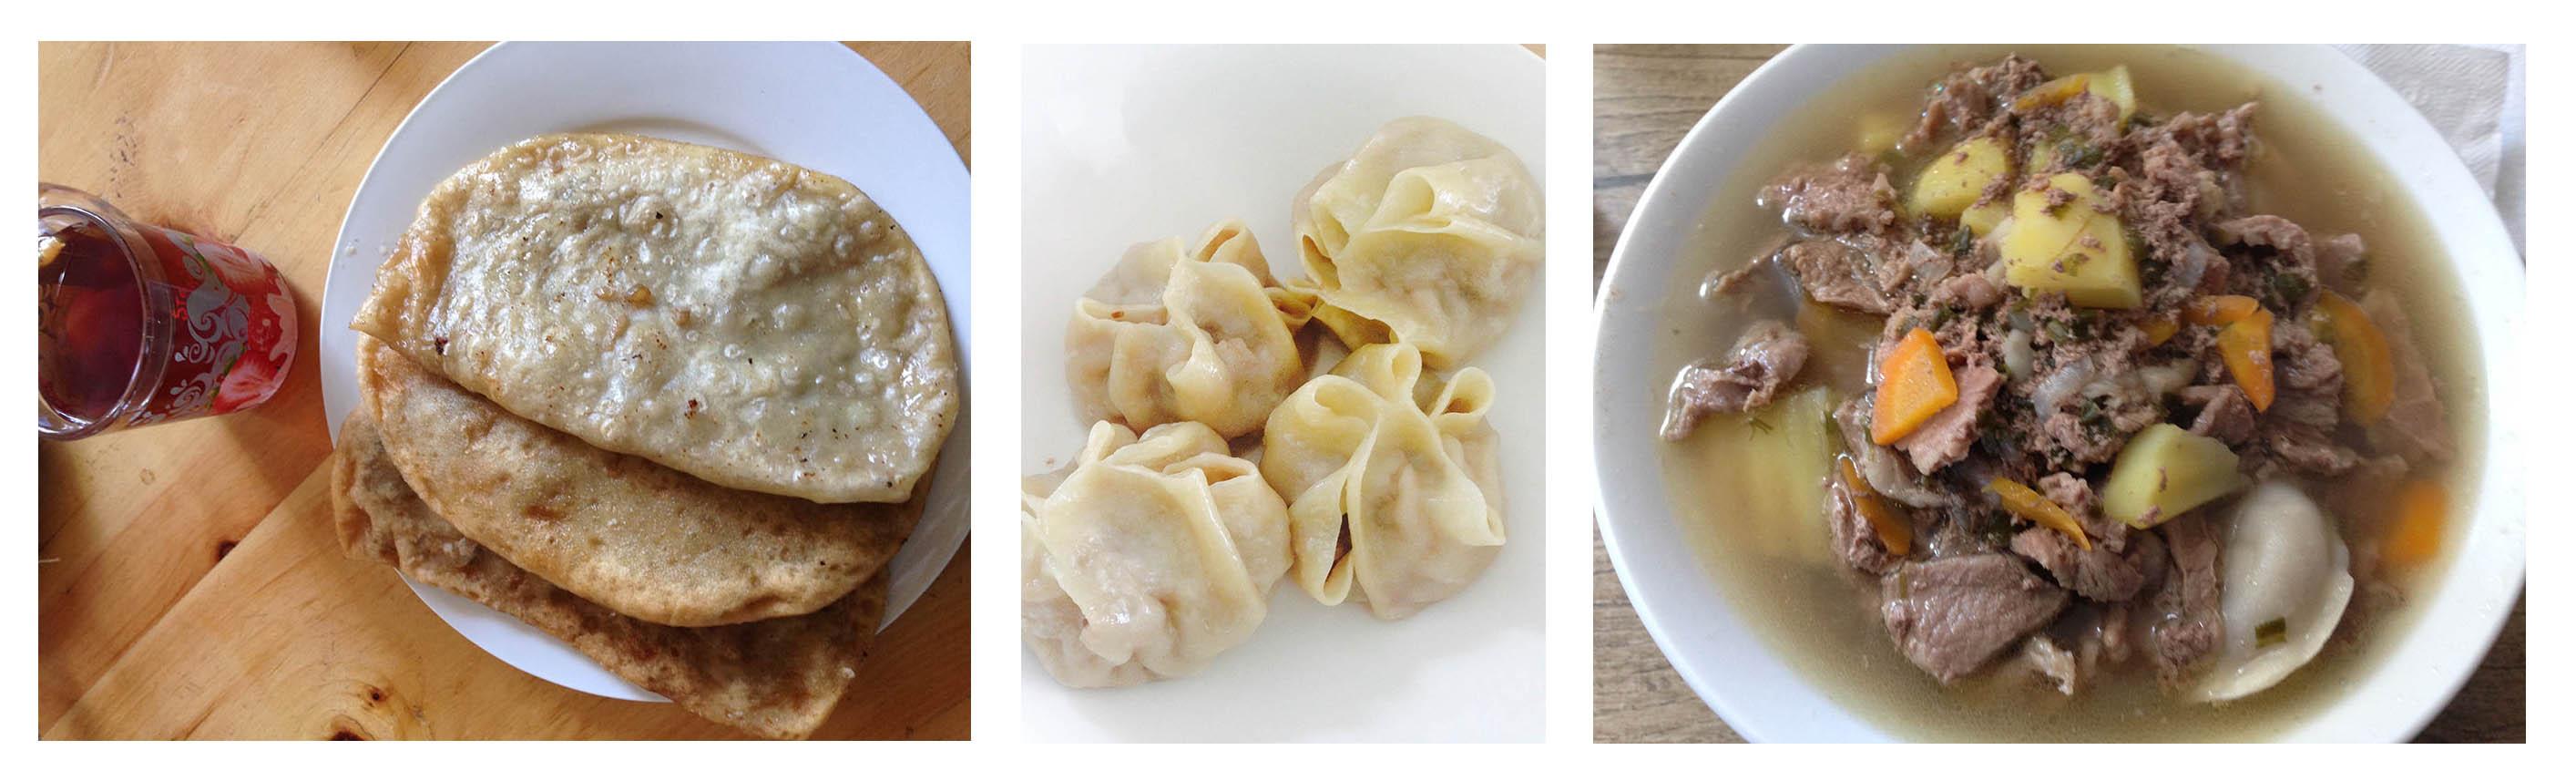 Cuisine en Mongolie - Dumpling